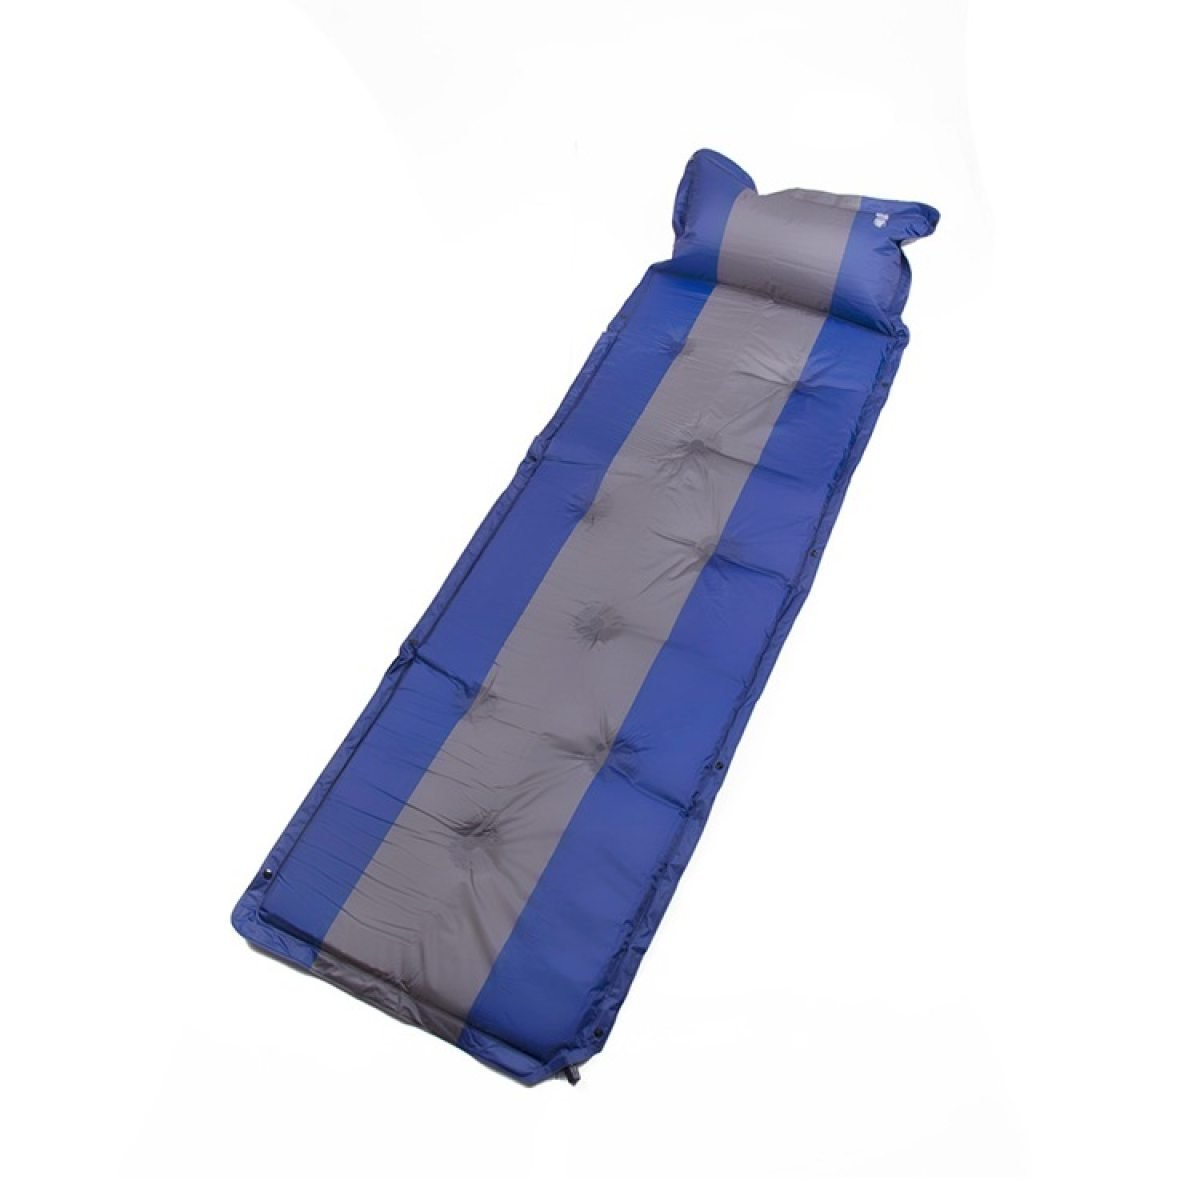 Camping Im Freien Selbstansaugende Schlafmatten Camping Mosaik Zelt Faltmatte Automatik Aufblasbare Kissen